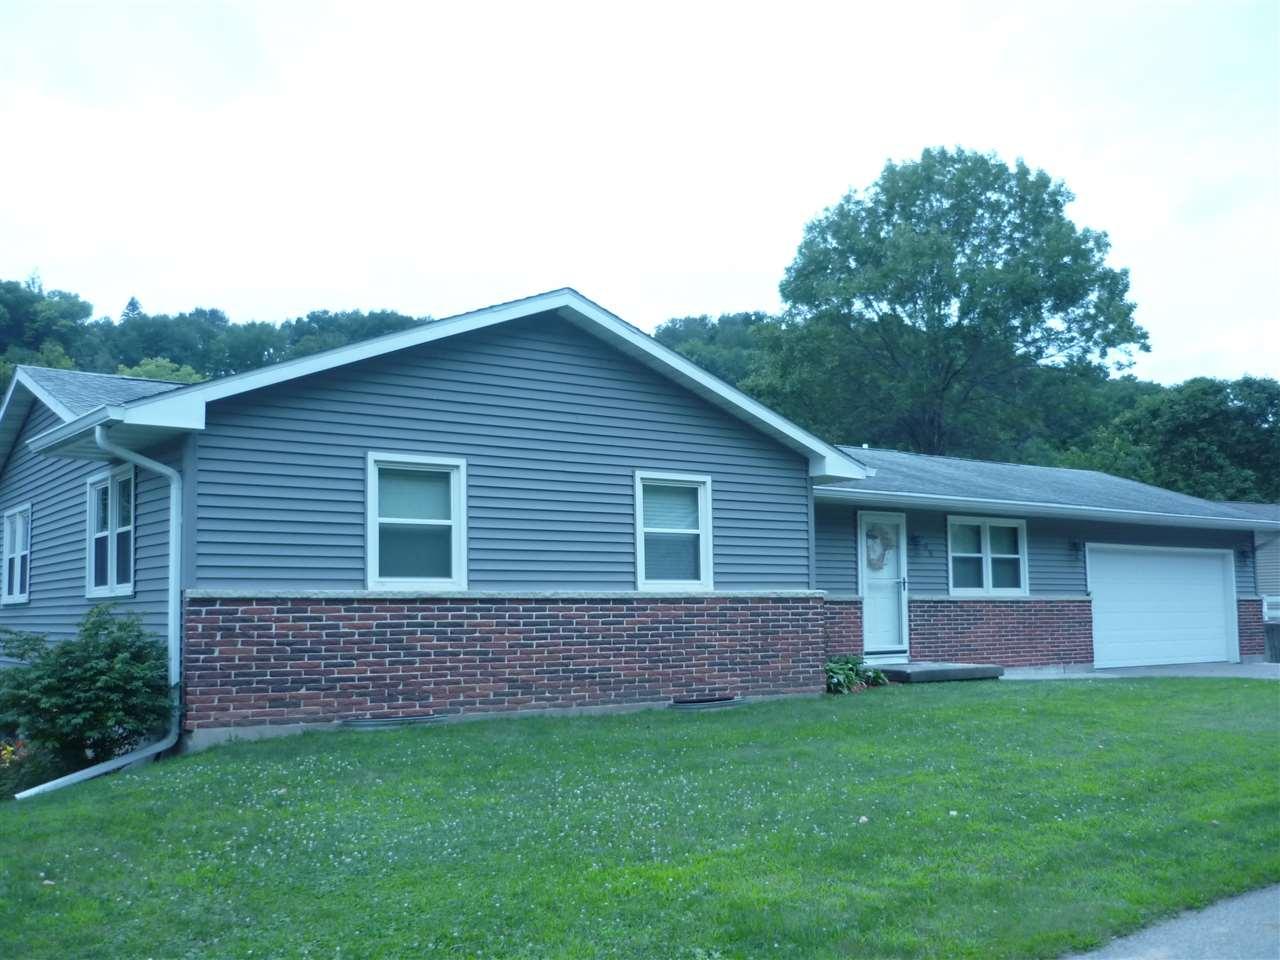 Real Estate for Sale, ListingId: 34473042, Bellevue,IA52031